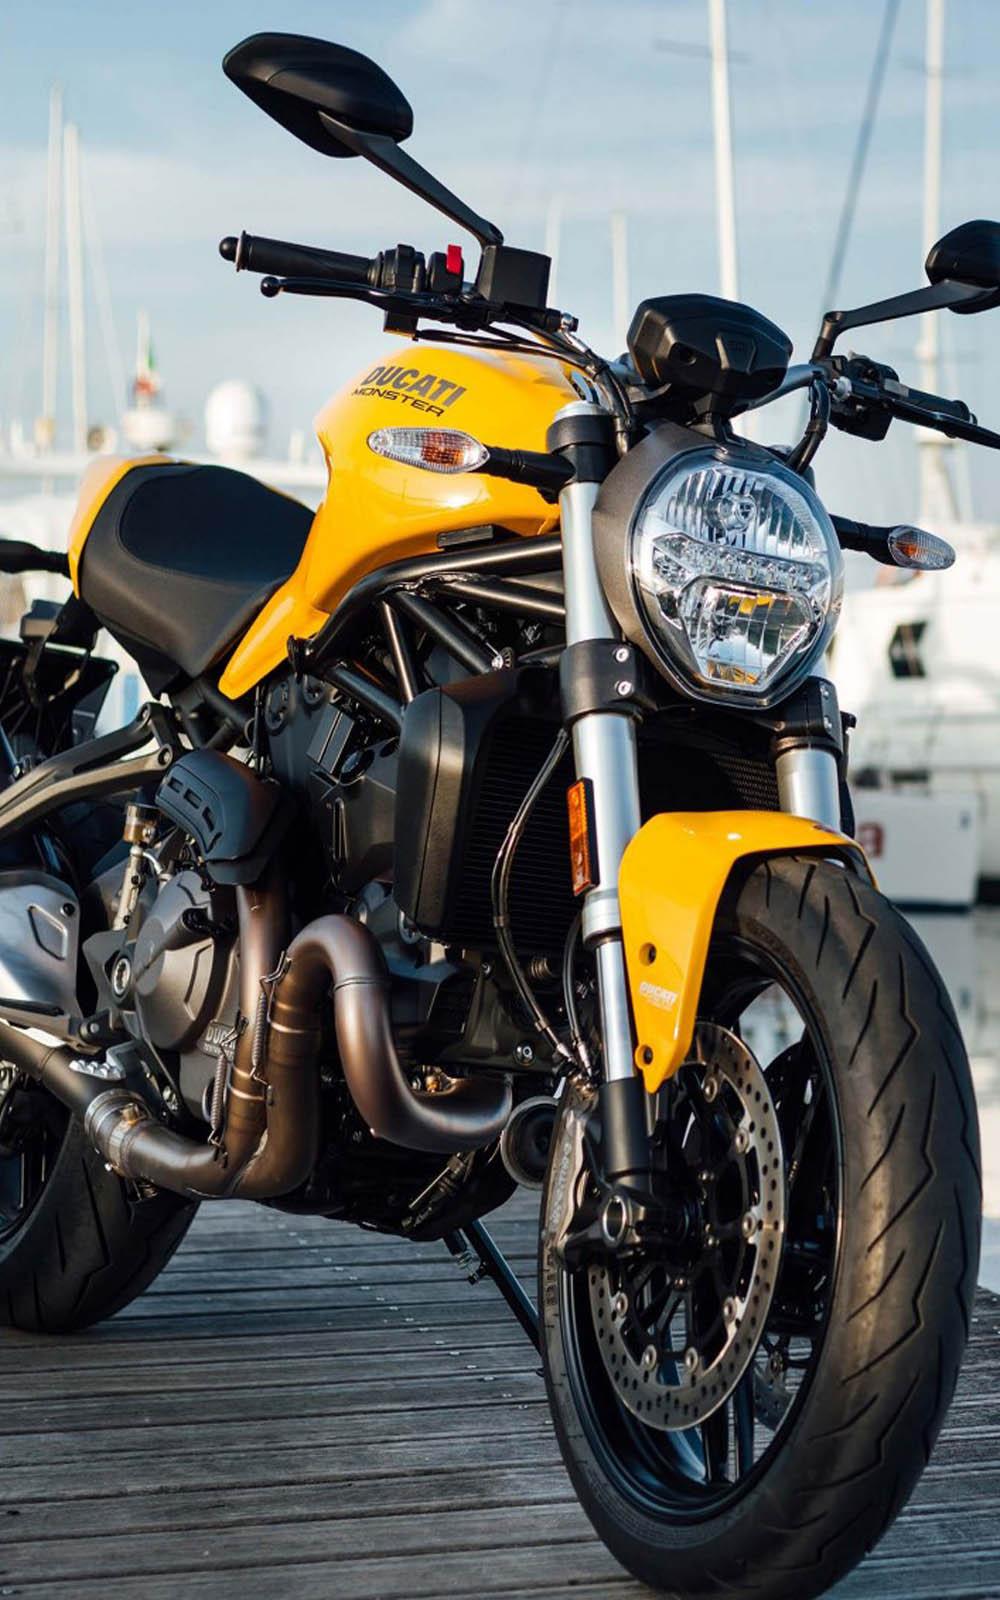 Amazing Wallpaper Mobile Bike - Ducati-Monster-821-HD-Mobile-Wallpaper  Gallery_784763.jpg